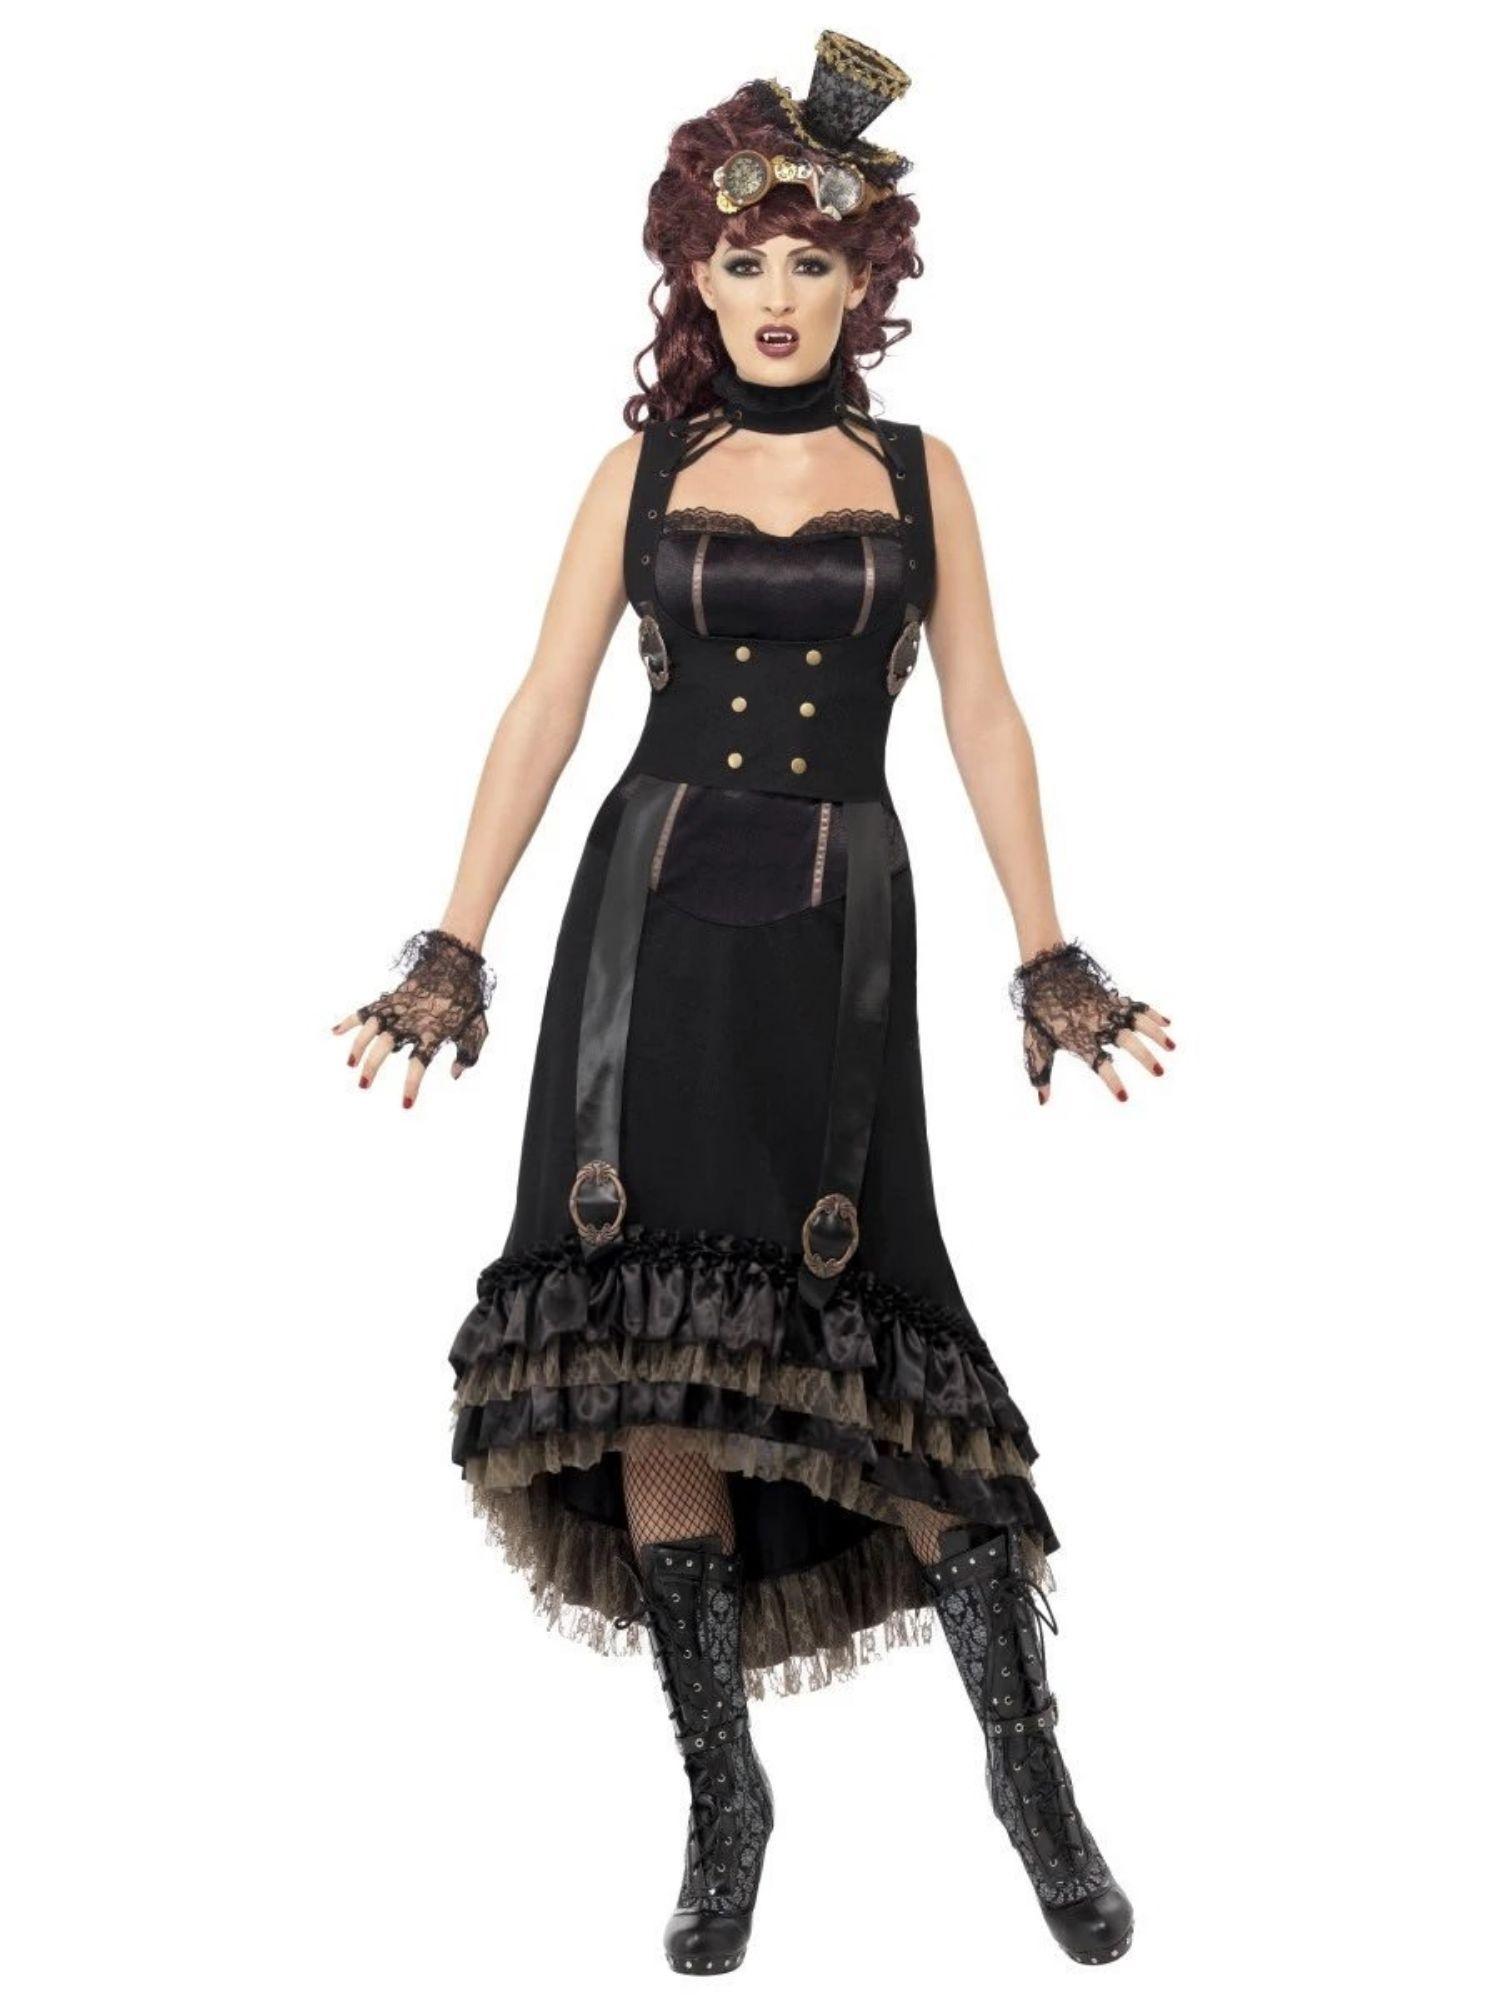 49 Black Steam Punk Vampire Women Adult Halloween Costume